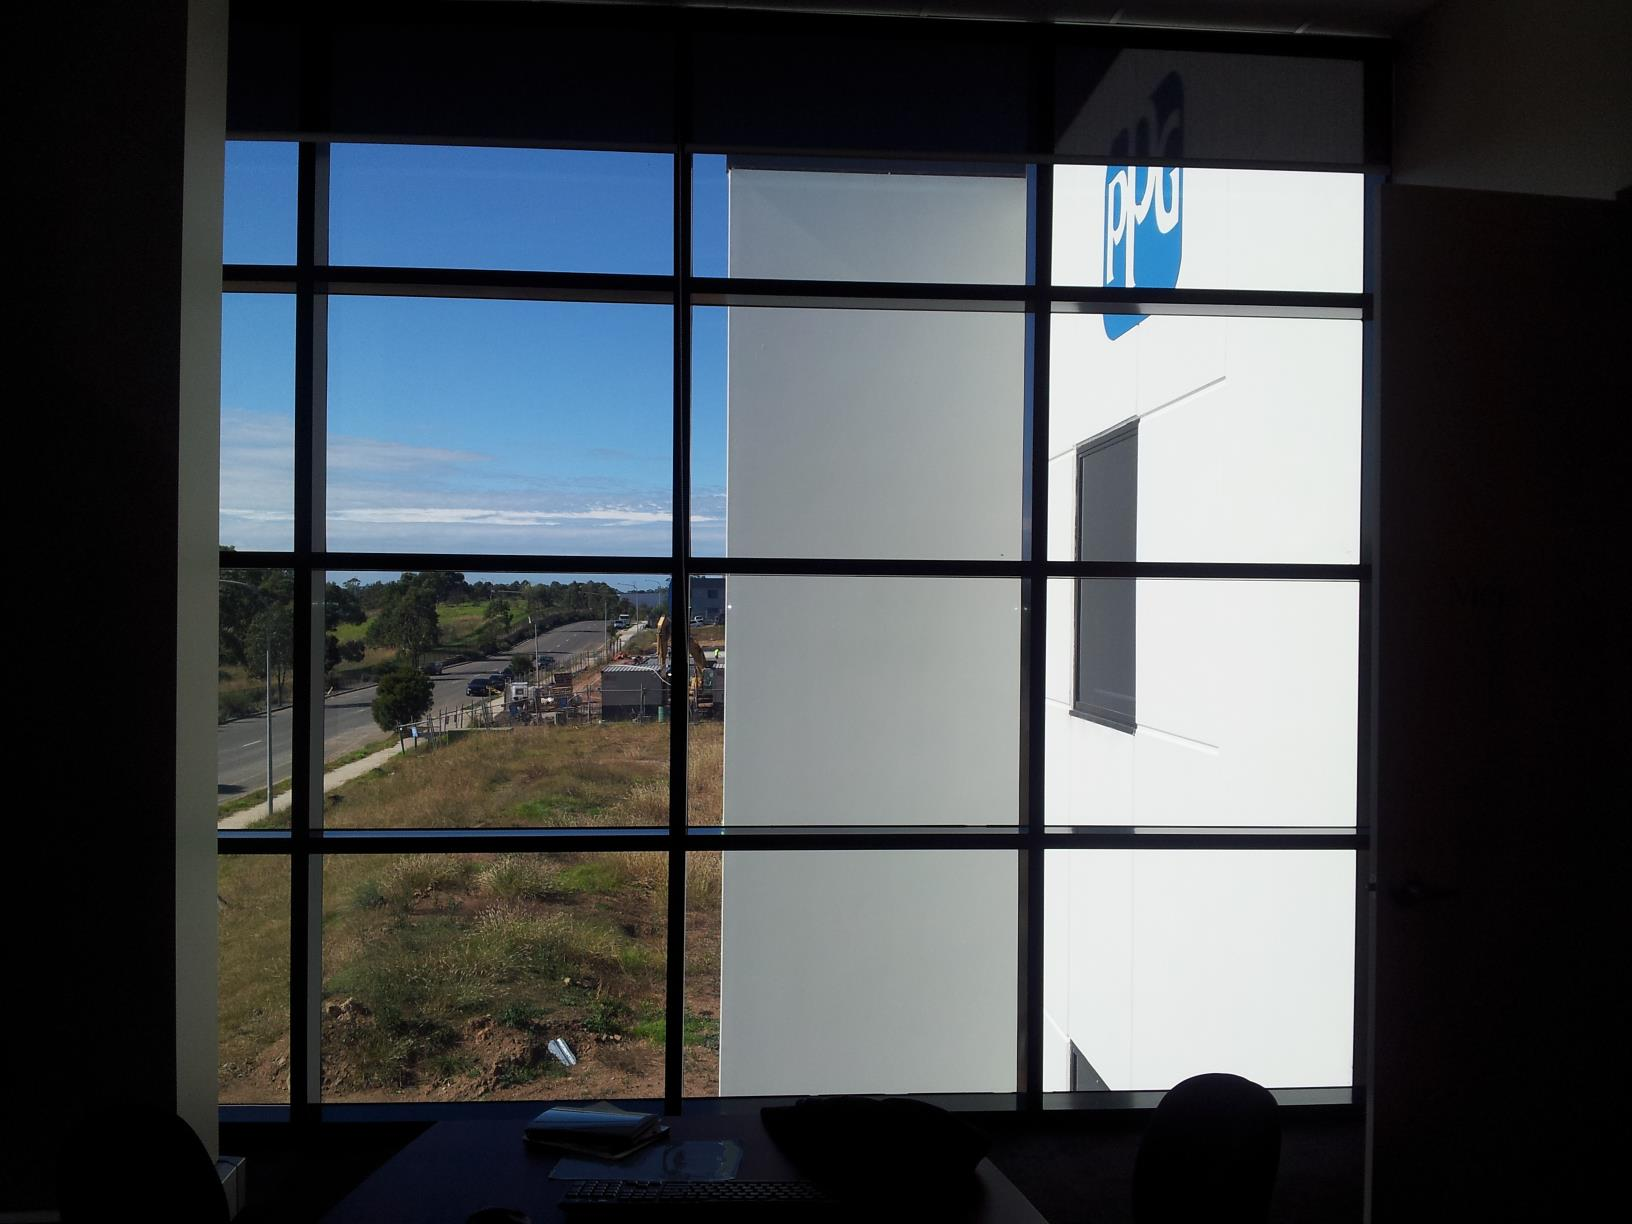 office-commercial-window-tinting-film-sydney-privacy reduce-heat-botany-mascot-randwick